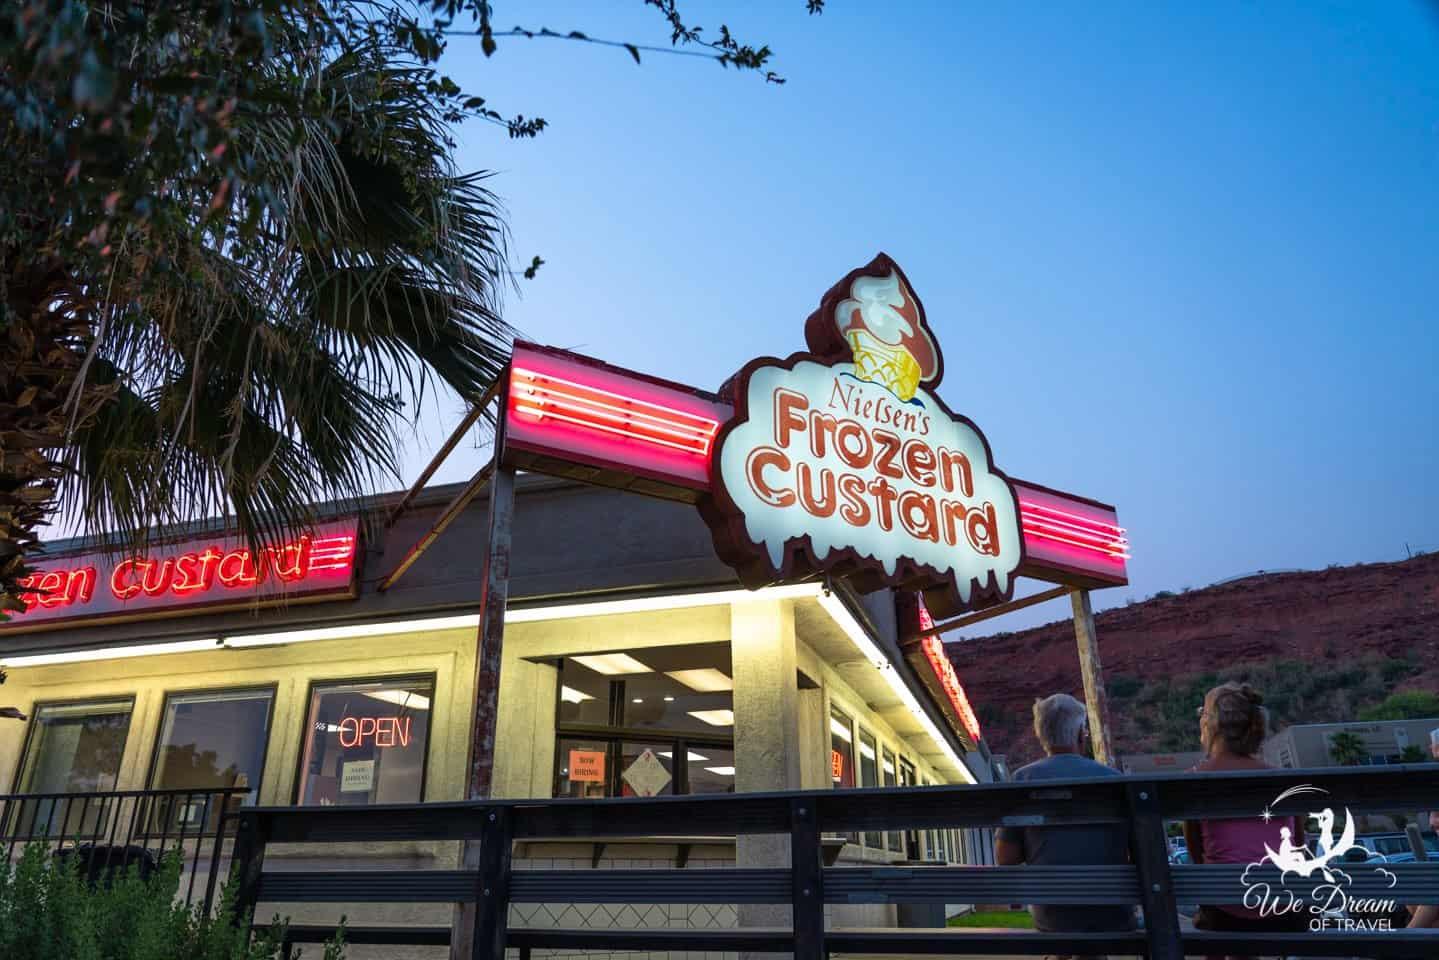 Nielsen's Frozen Custard is a firm favorite for dessert in St George